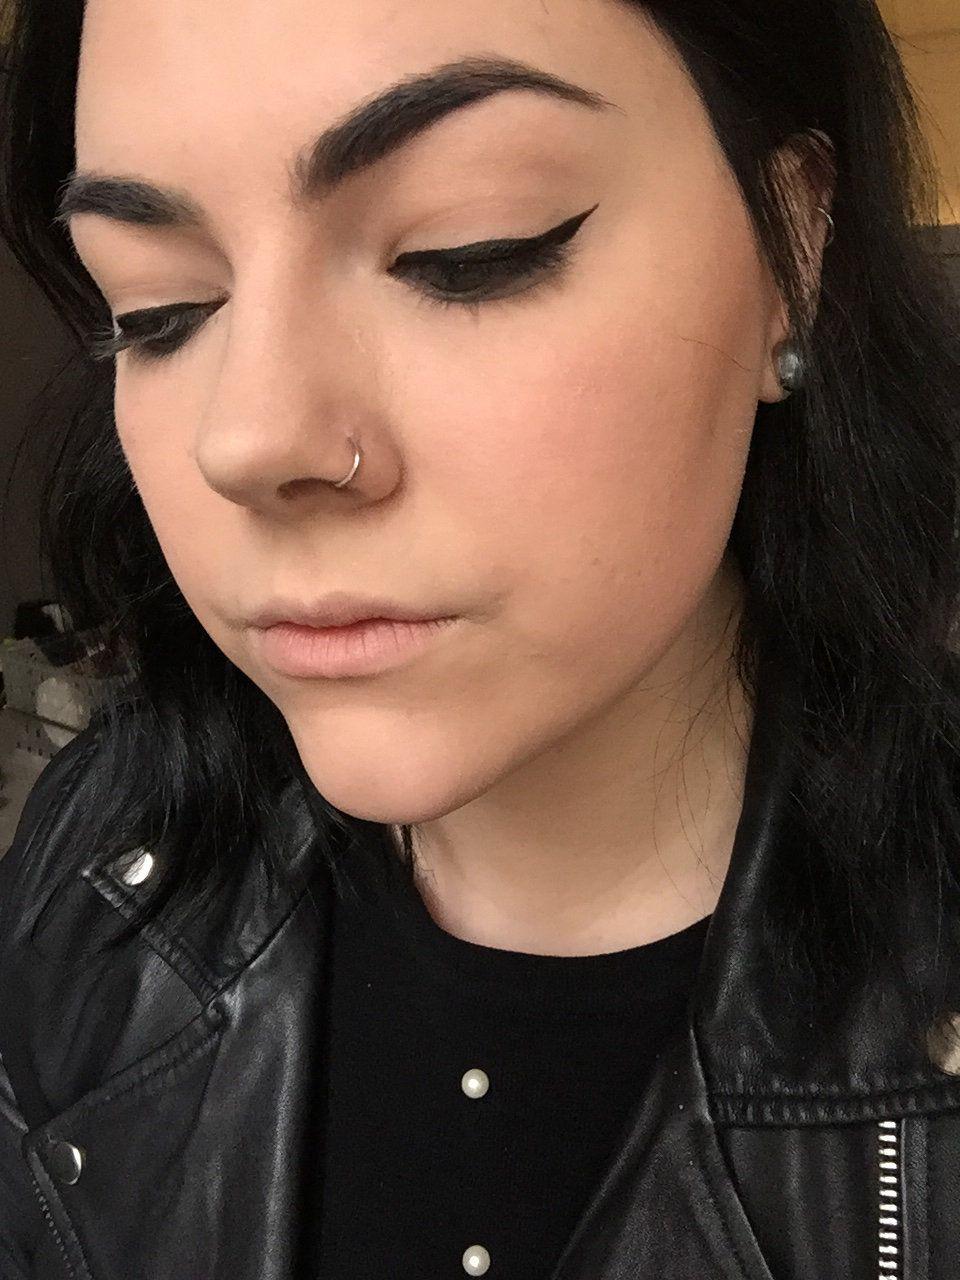 I did my makeup according to Lauren Conrad's beauty book